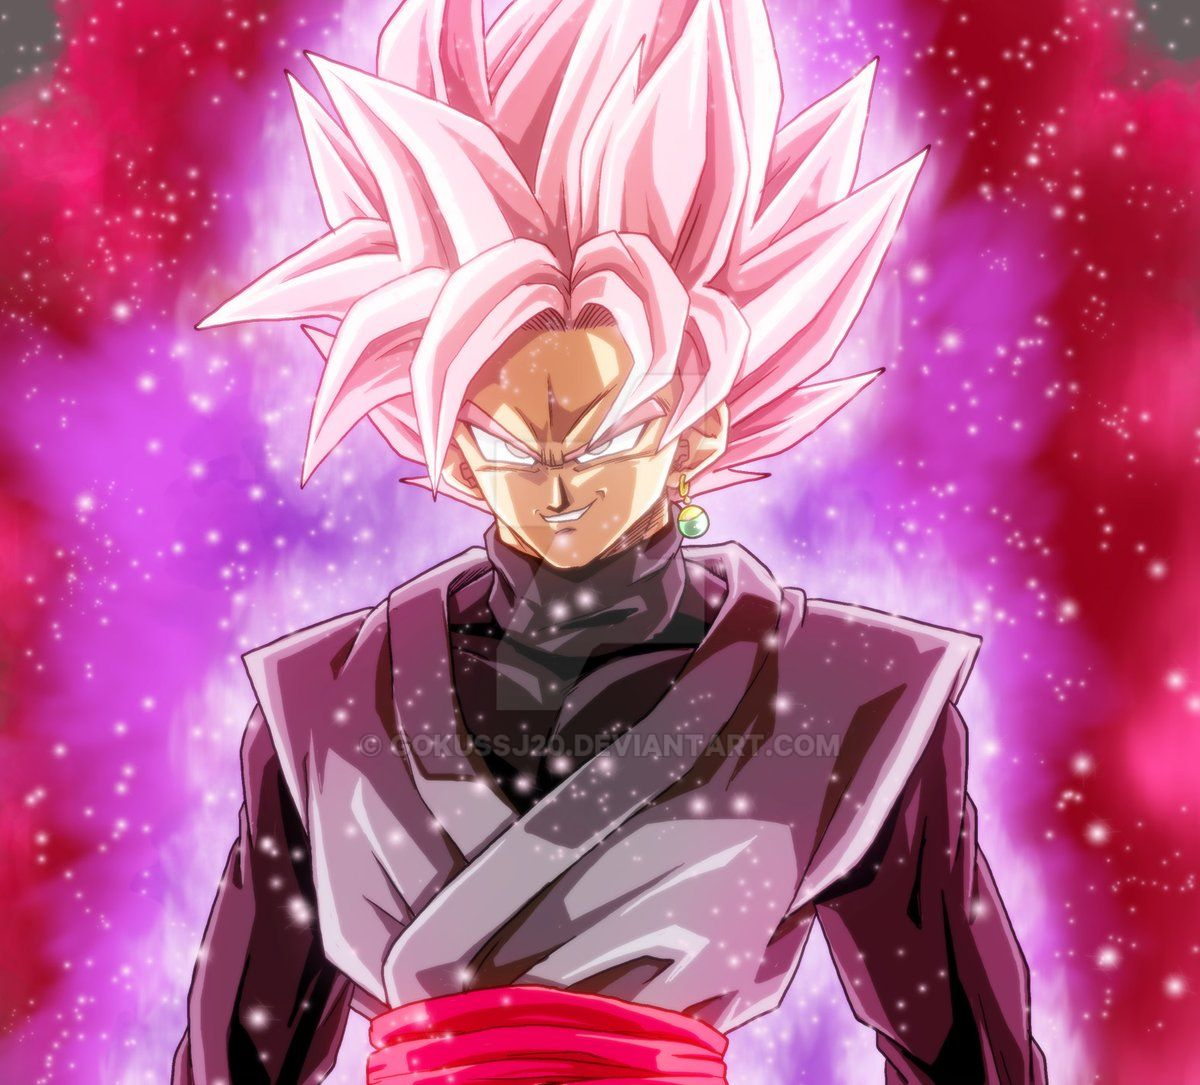 Dragon Ball Super Wallpaper 1080p Full Size: Goku Black Super Saiyan Rose By Gokussj20 On DeviantArt